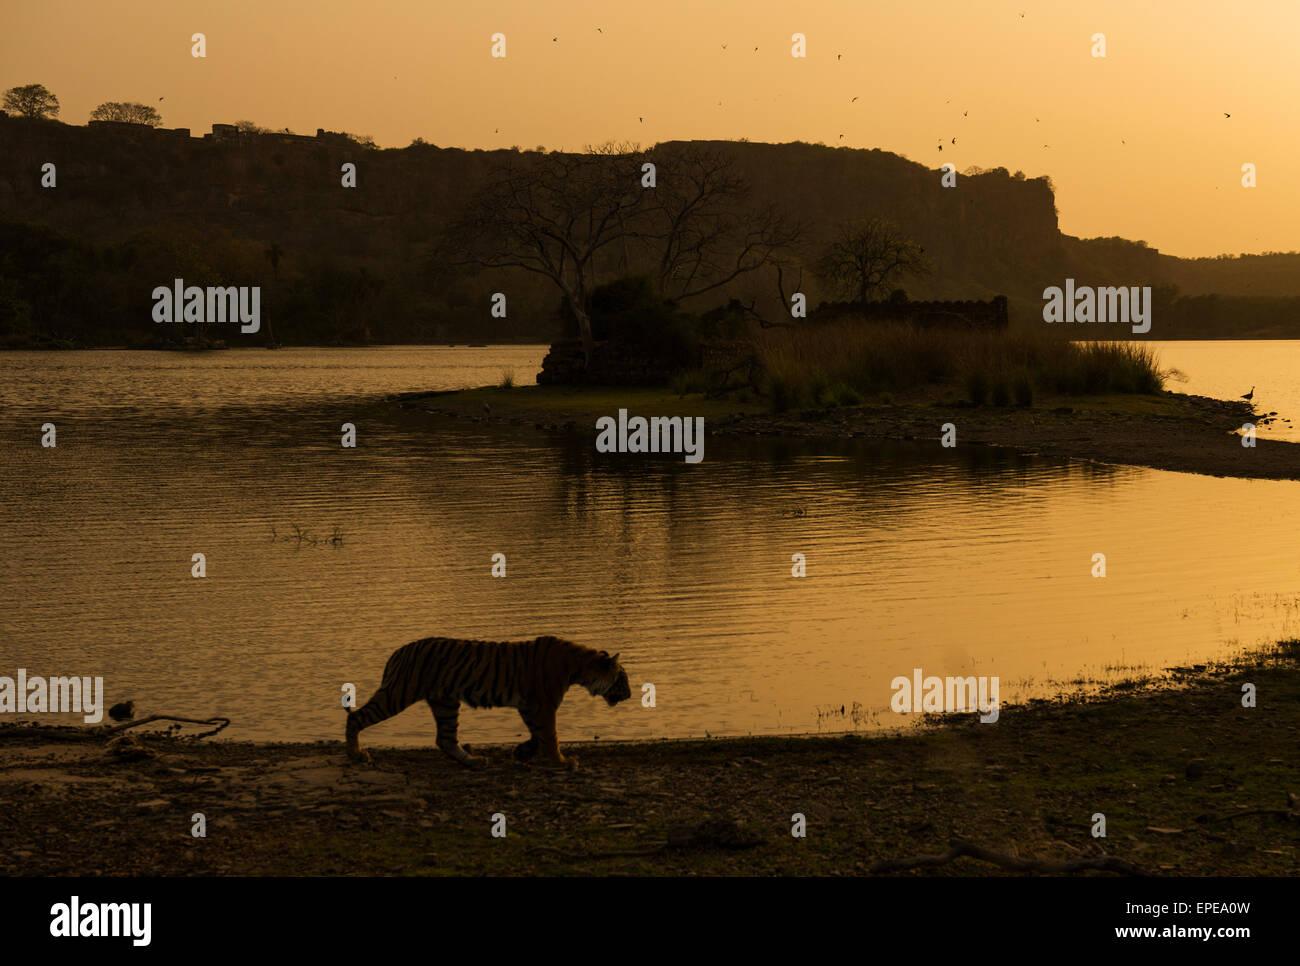 Wild Indian tiger walking along a lake at sunset in Ranthambore national park - Stock Image